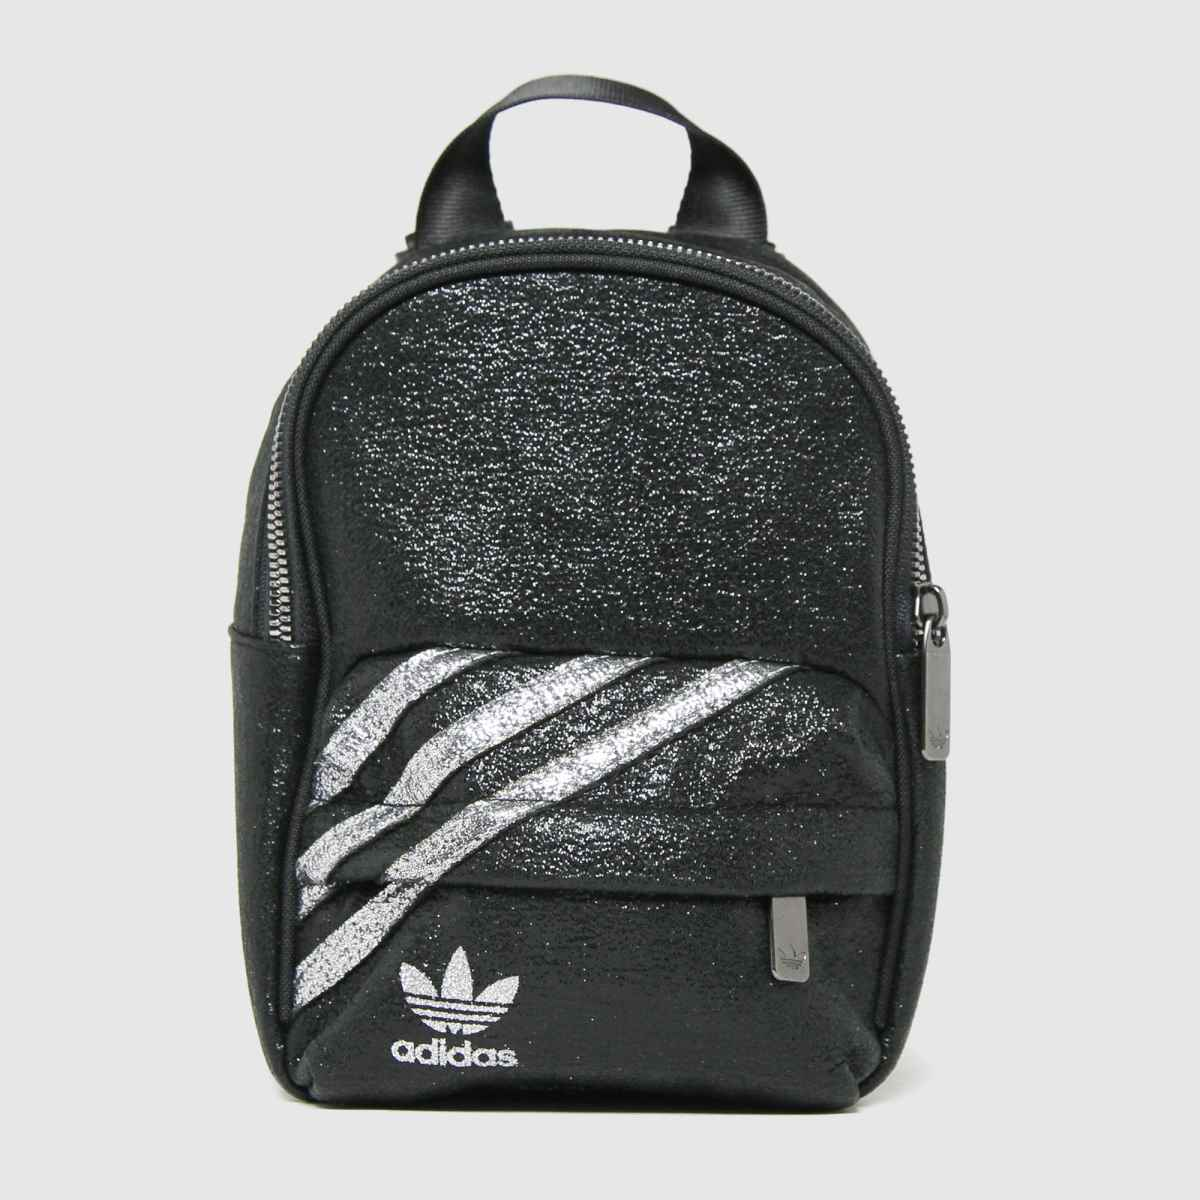 Adidas Black Bp Mini